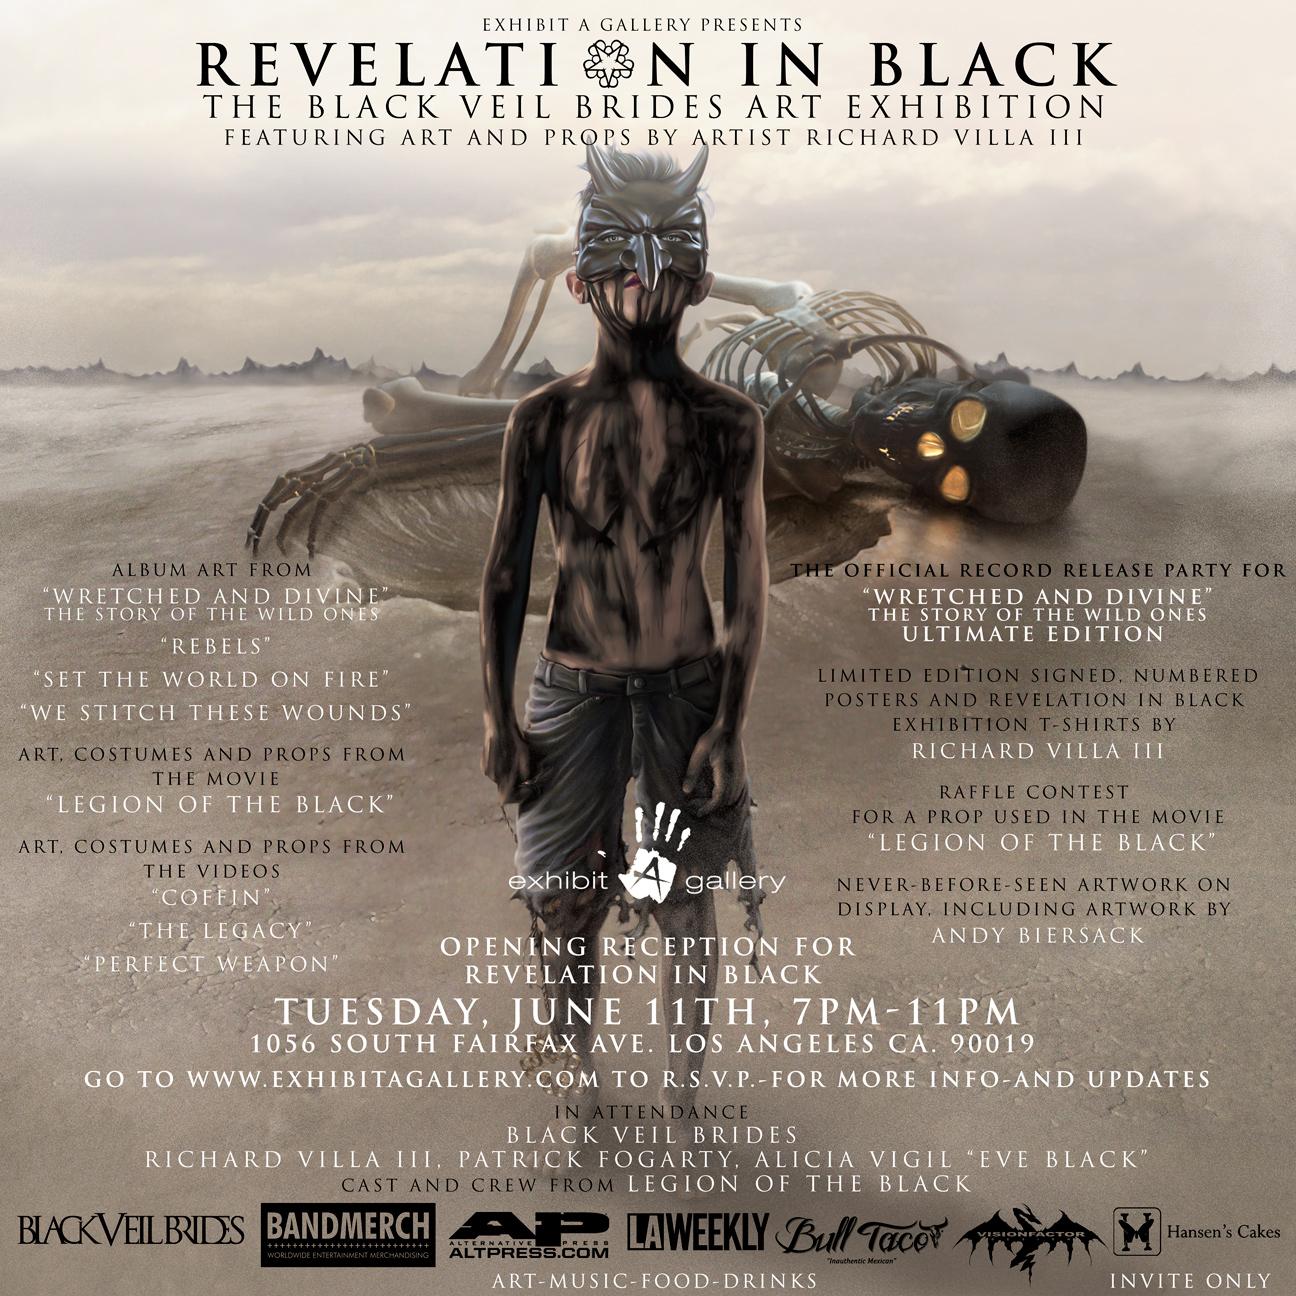 revelation-in-black-invite2.jpg